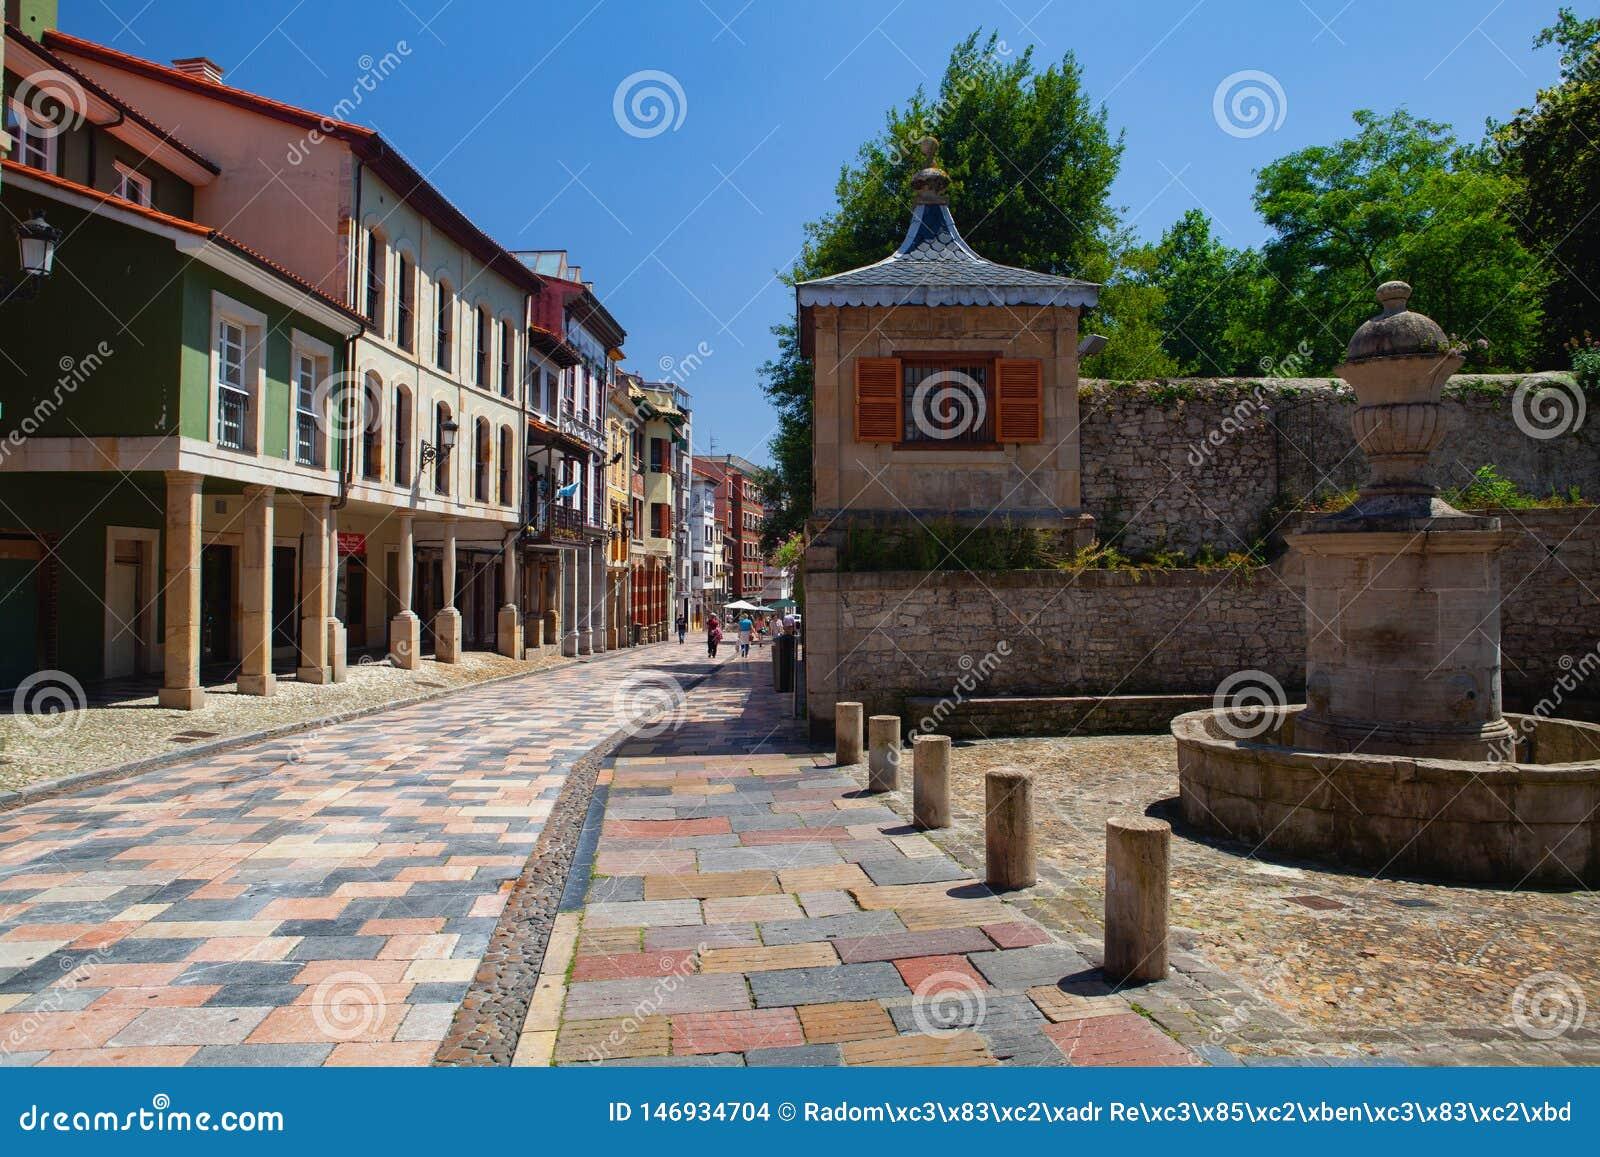 Arcades και στήλες στη διάσημη αρχαία πόλη Aviles, Ισπανία